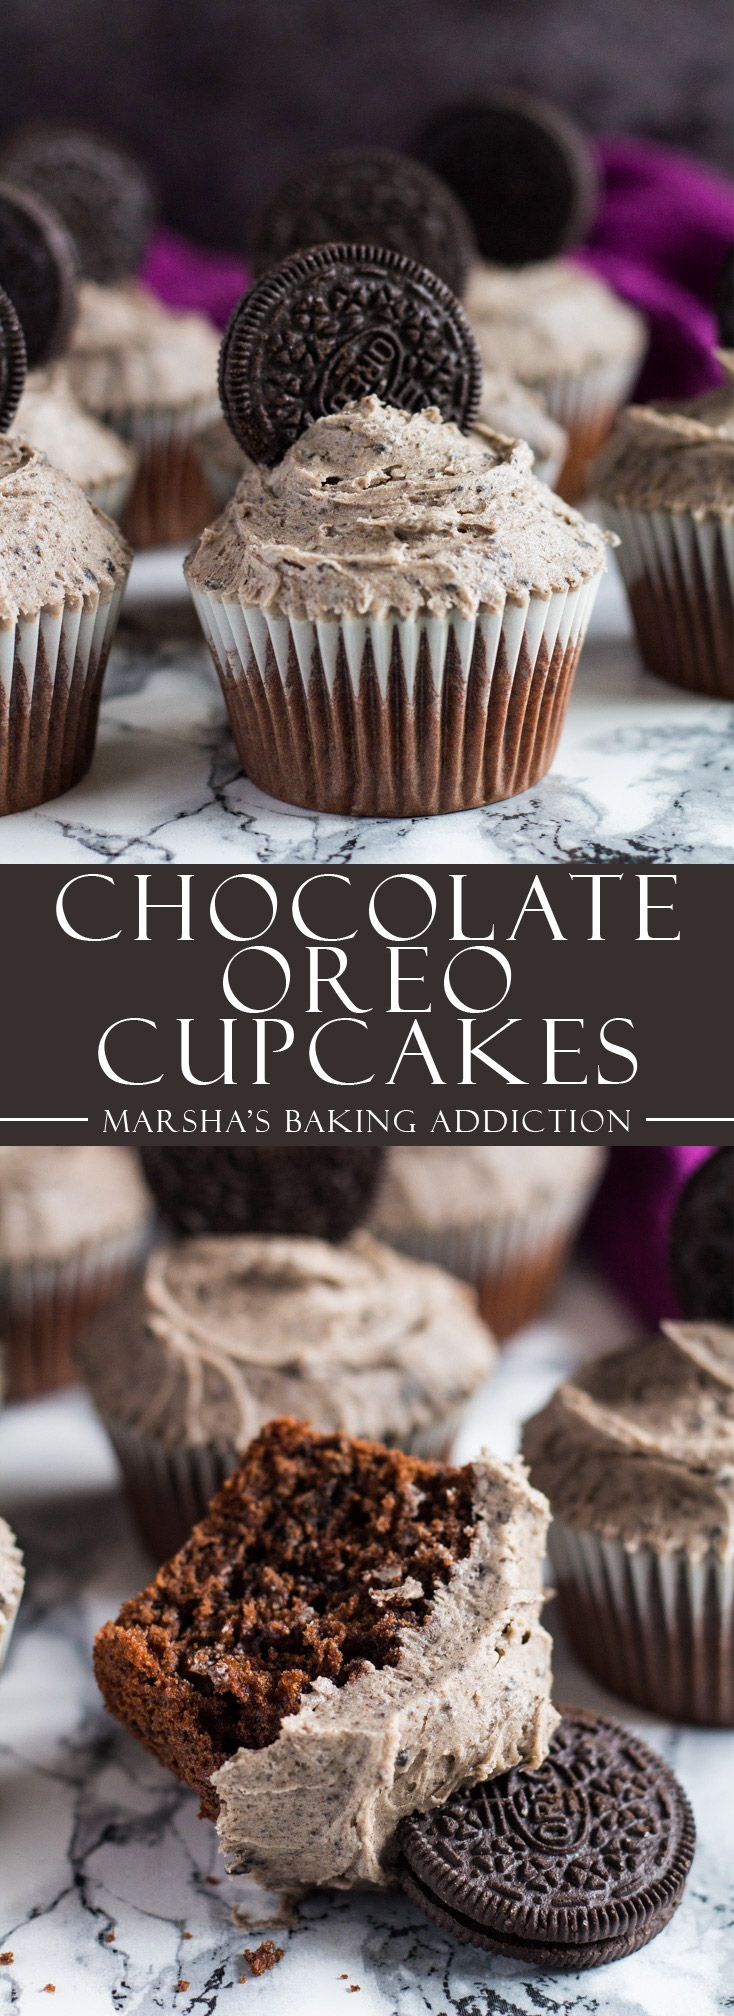 Chocolate Oreo Cupcakes | marshasbakingaddiction.com @marshasbakeblog